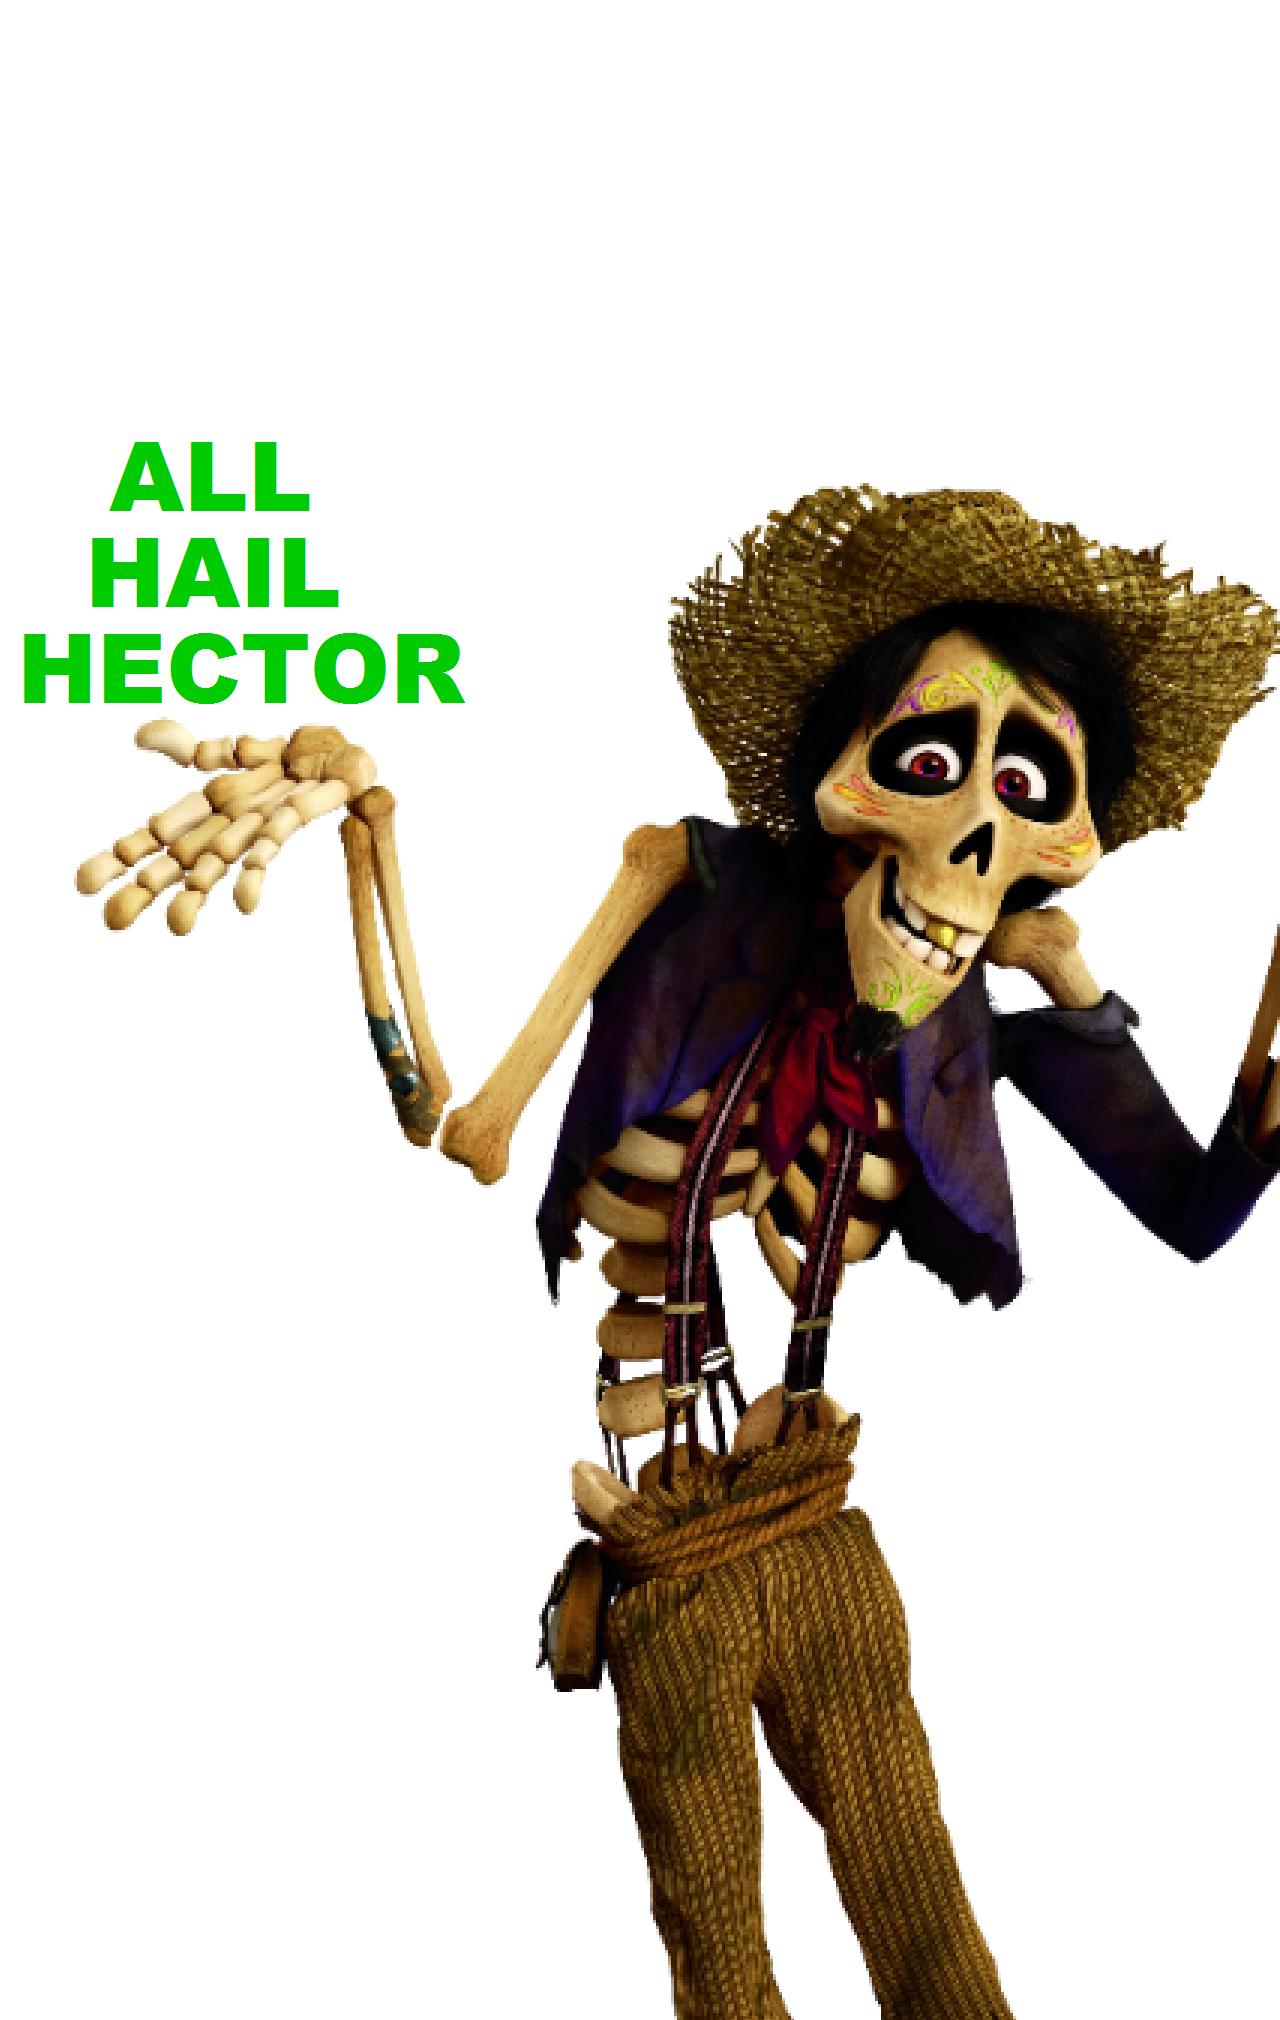 All Hail Hector